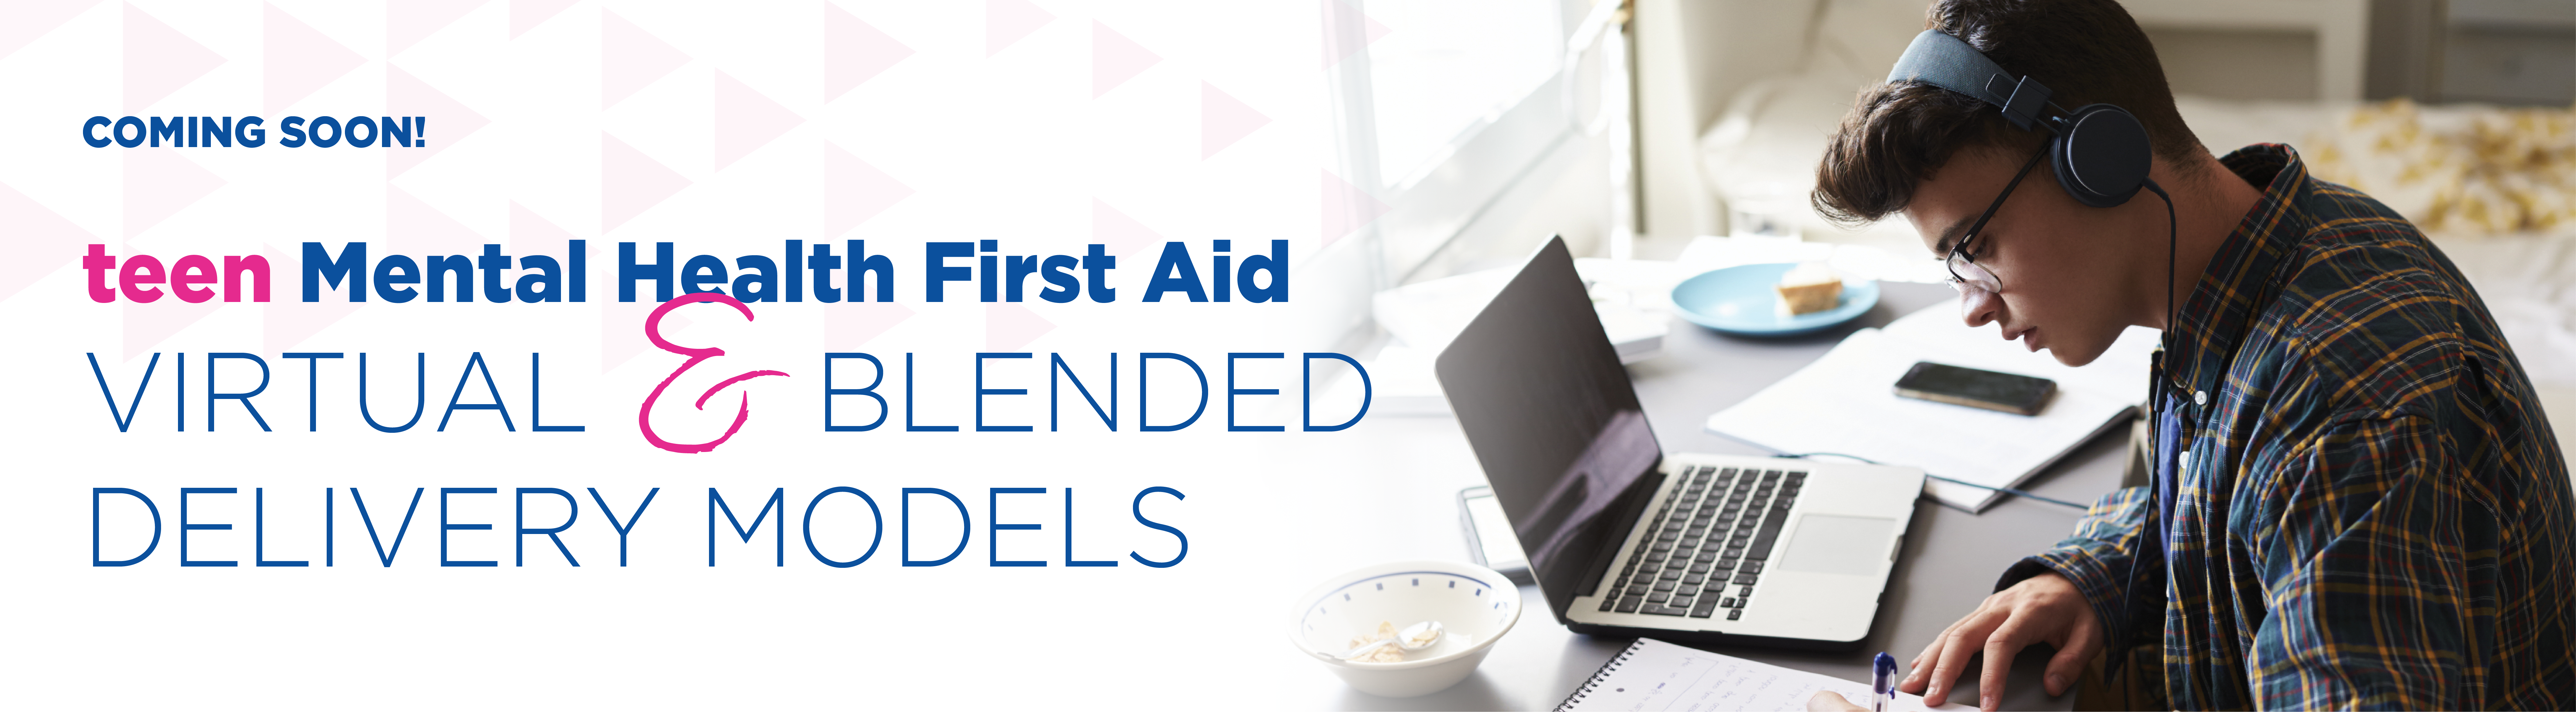 teen Mental Health First Aid Virtual & Blended Models Coming Soon!